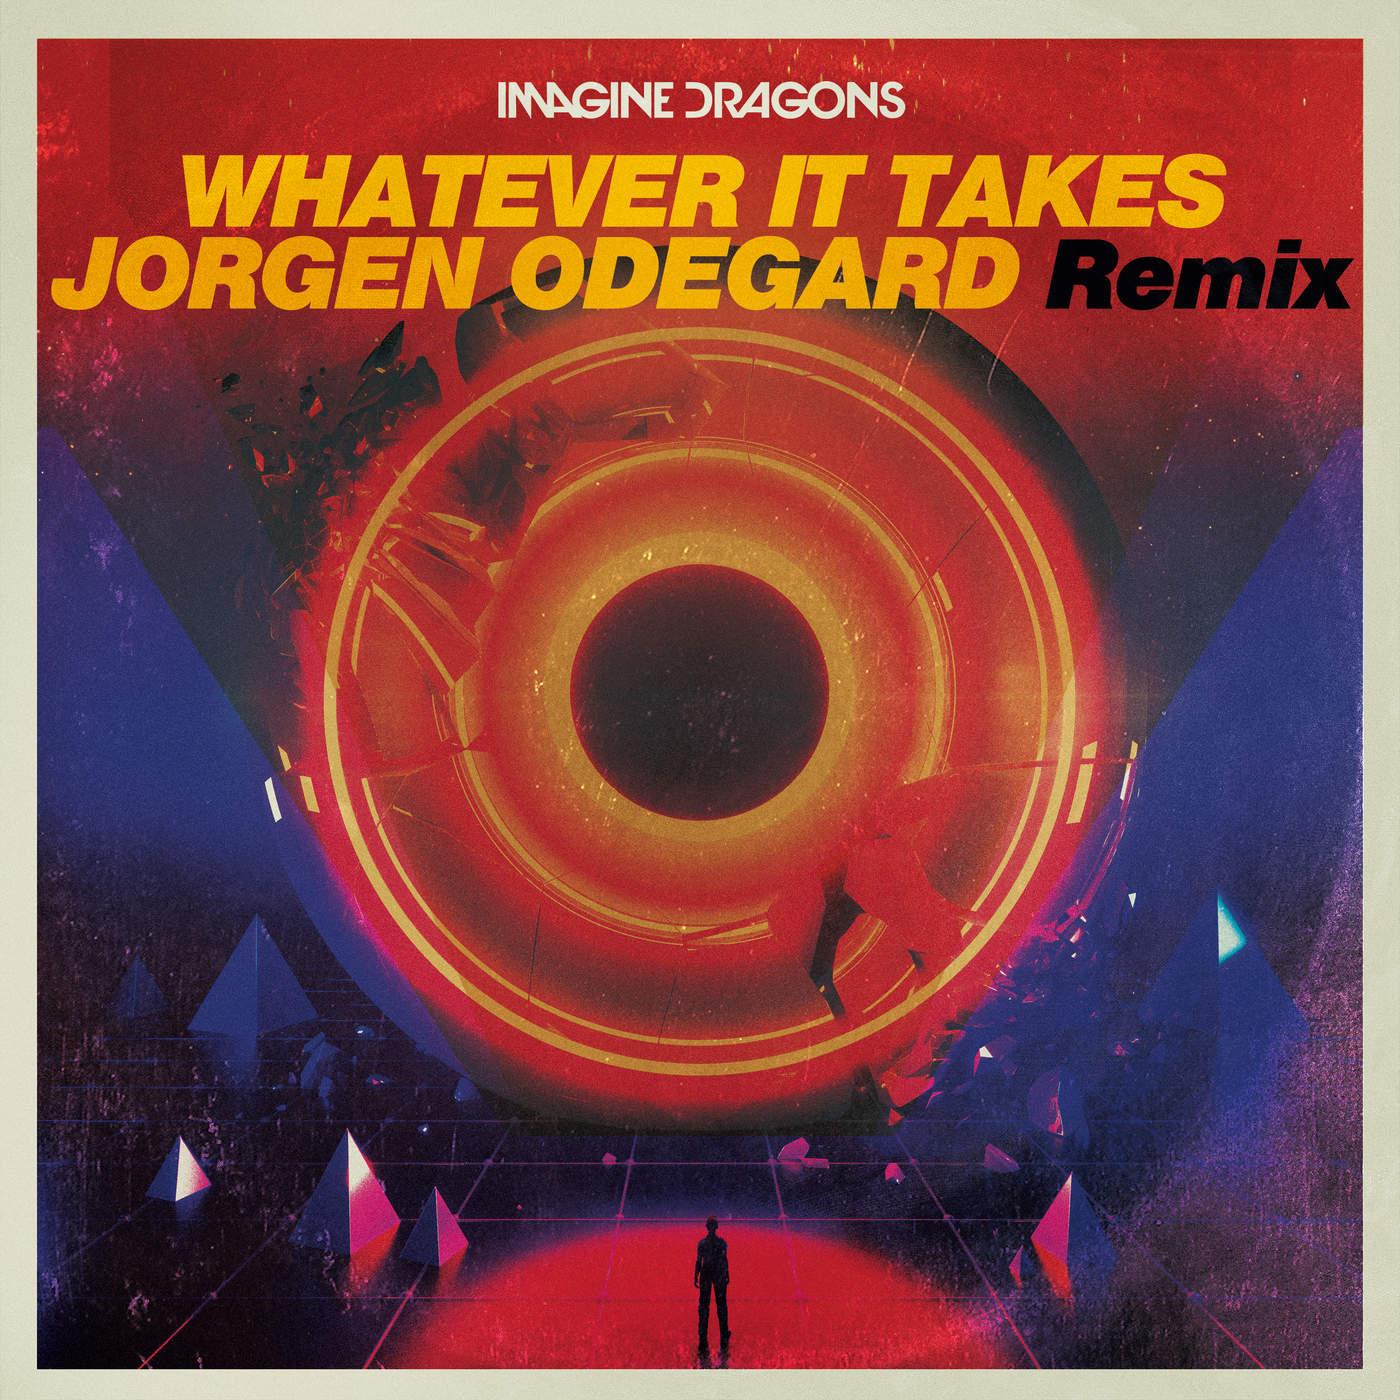 Imagine Dragons & Jorgen Odegard - Whatever It Takes (Jorgen Odegard Remix) - Single